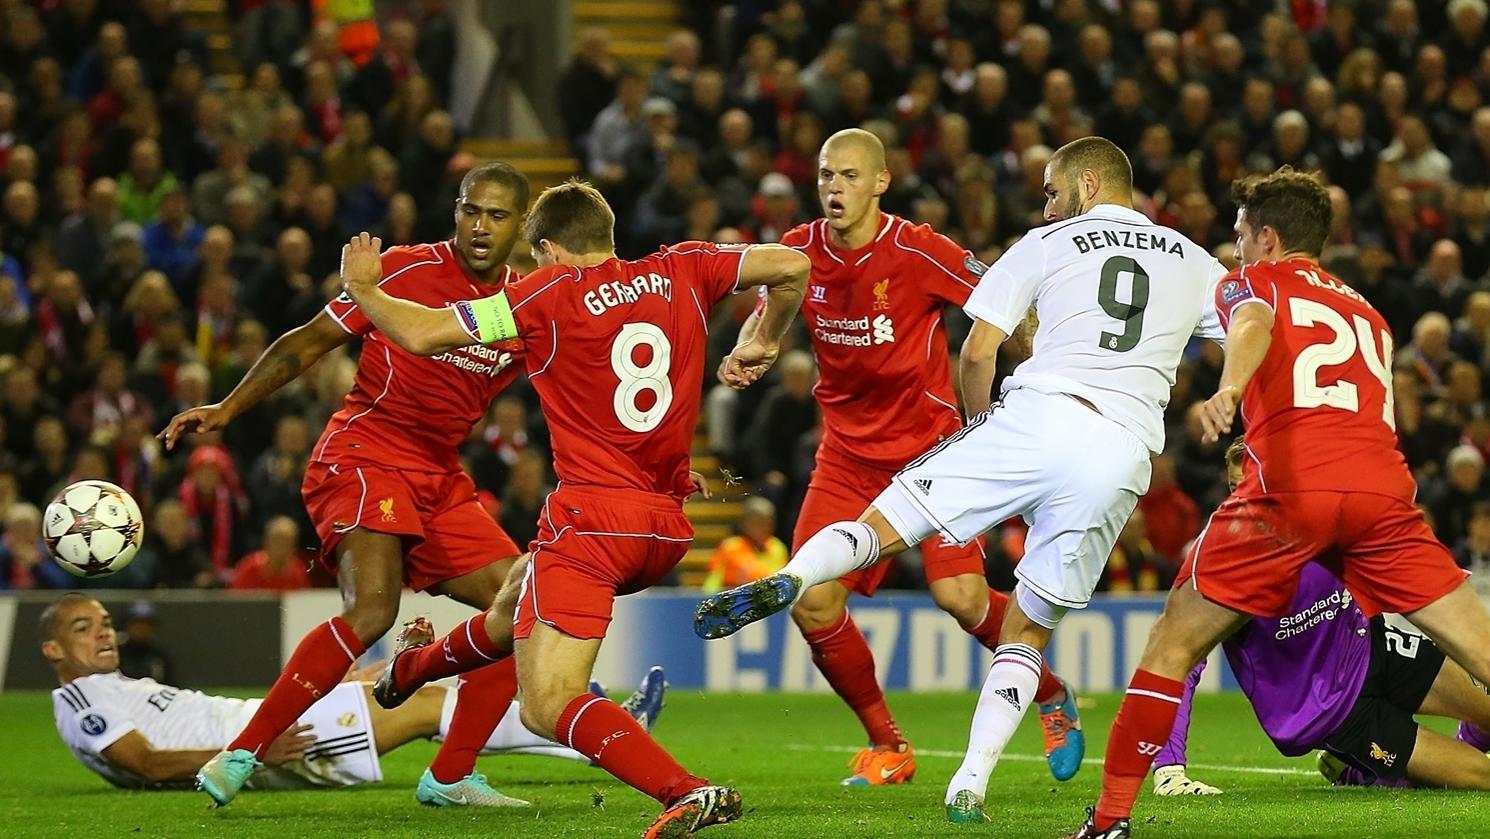 Real Madrid - Liverpool: enfrentamientos anteriores   UEFA Champions League    UEFA.com